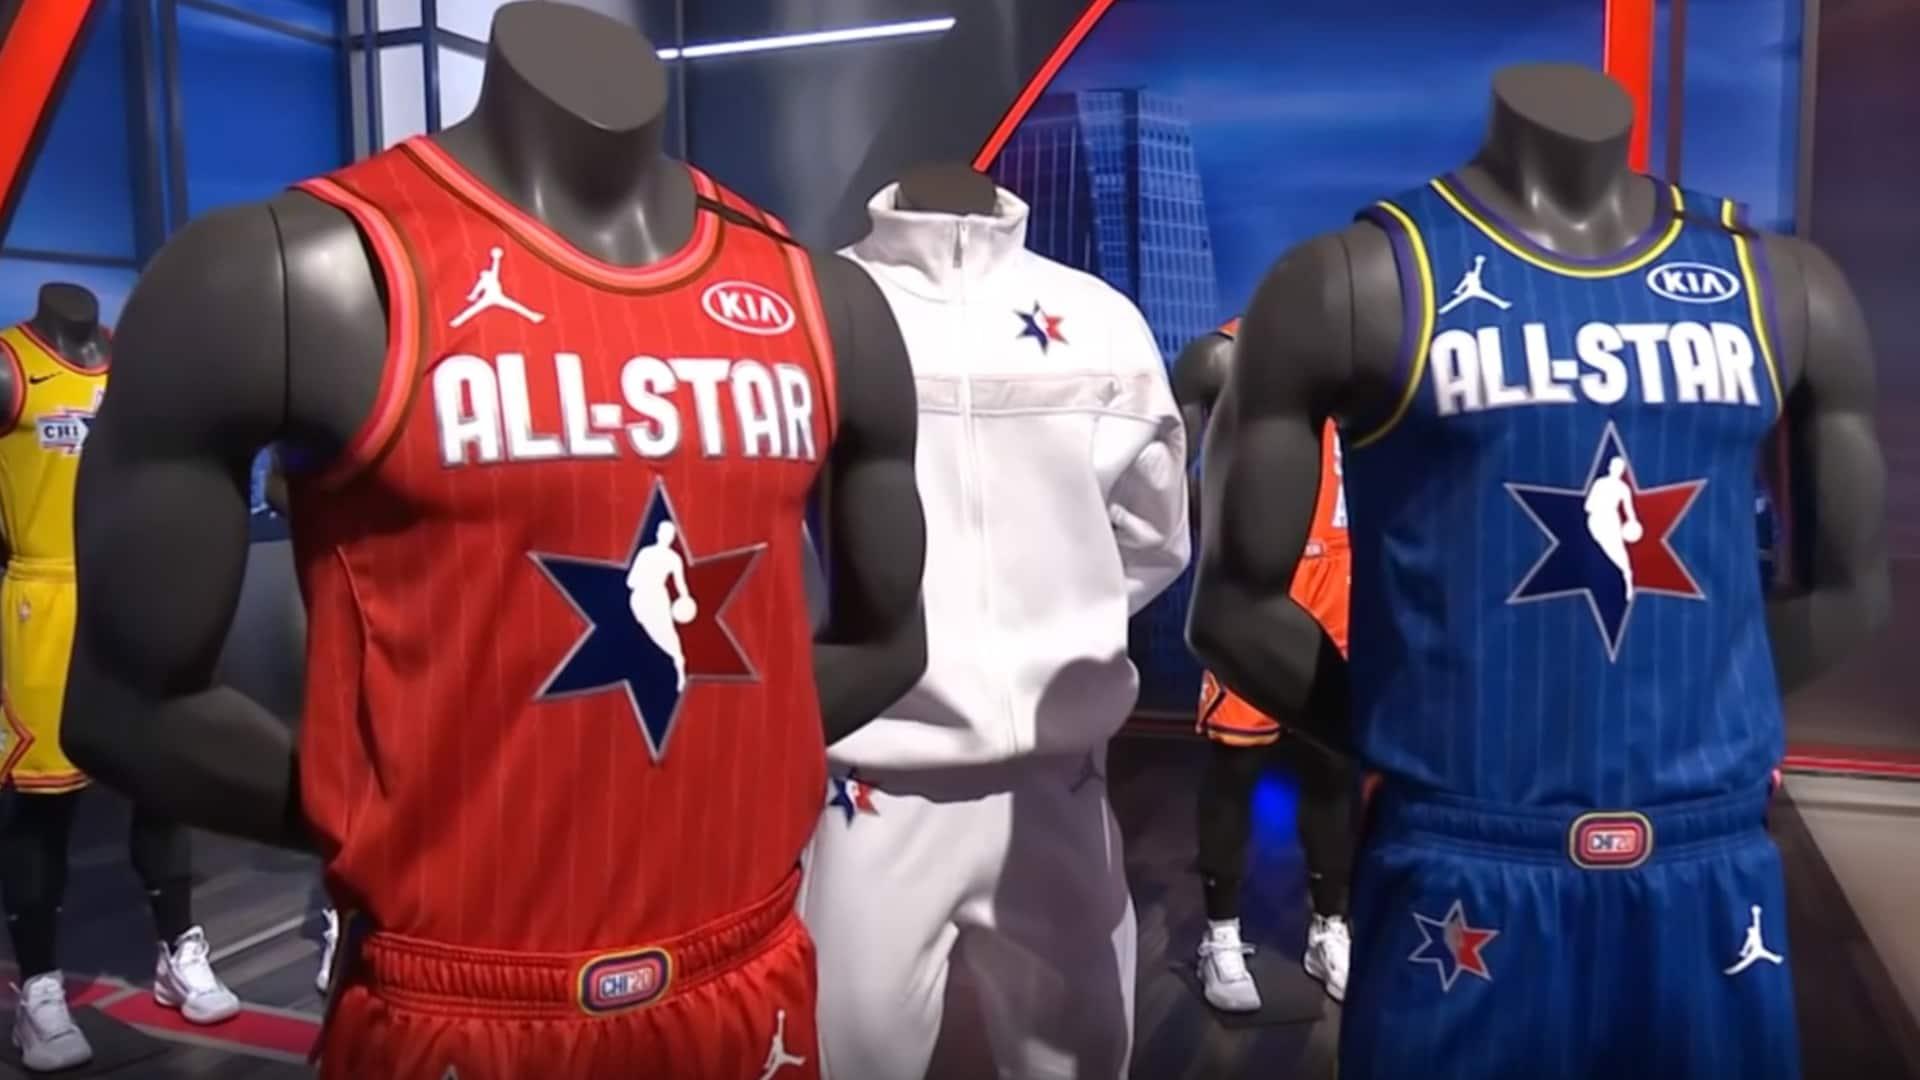 NBA, NBPA and Nike to honor Kobe and Gianna Bryant on NBA All-Star uniforms